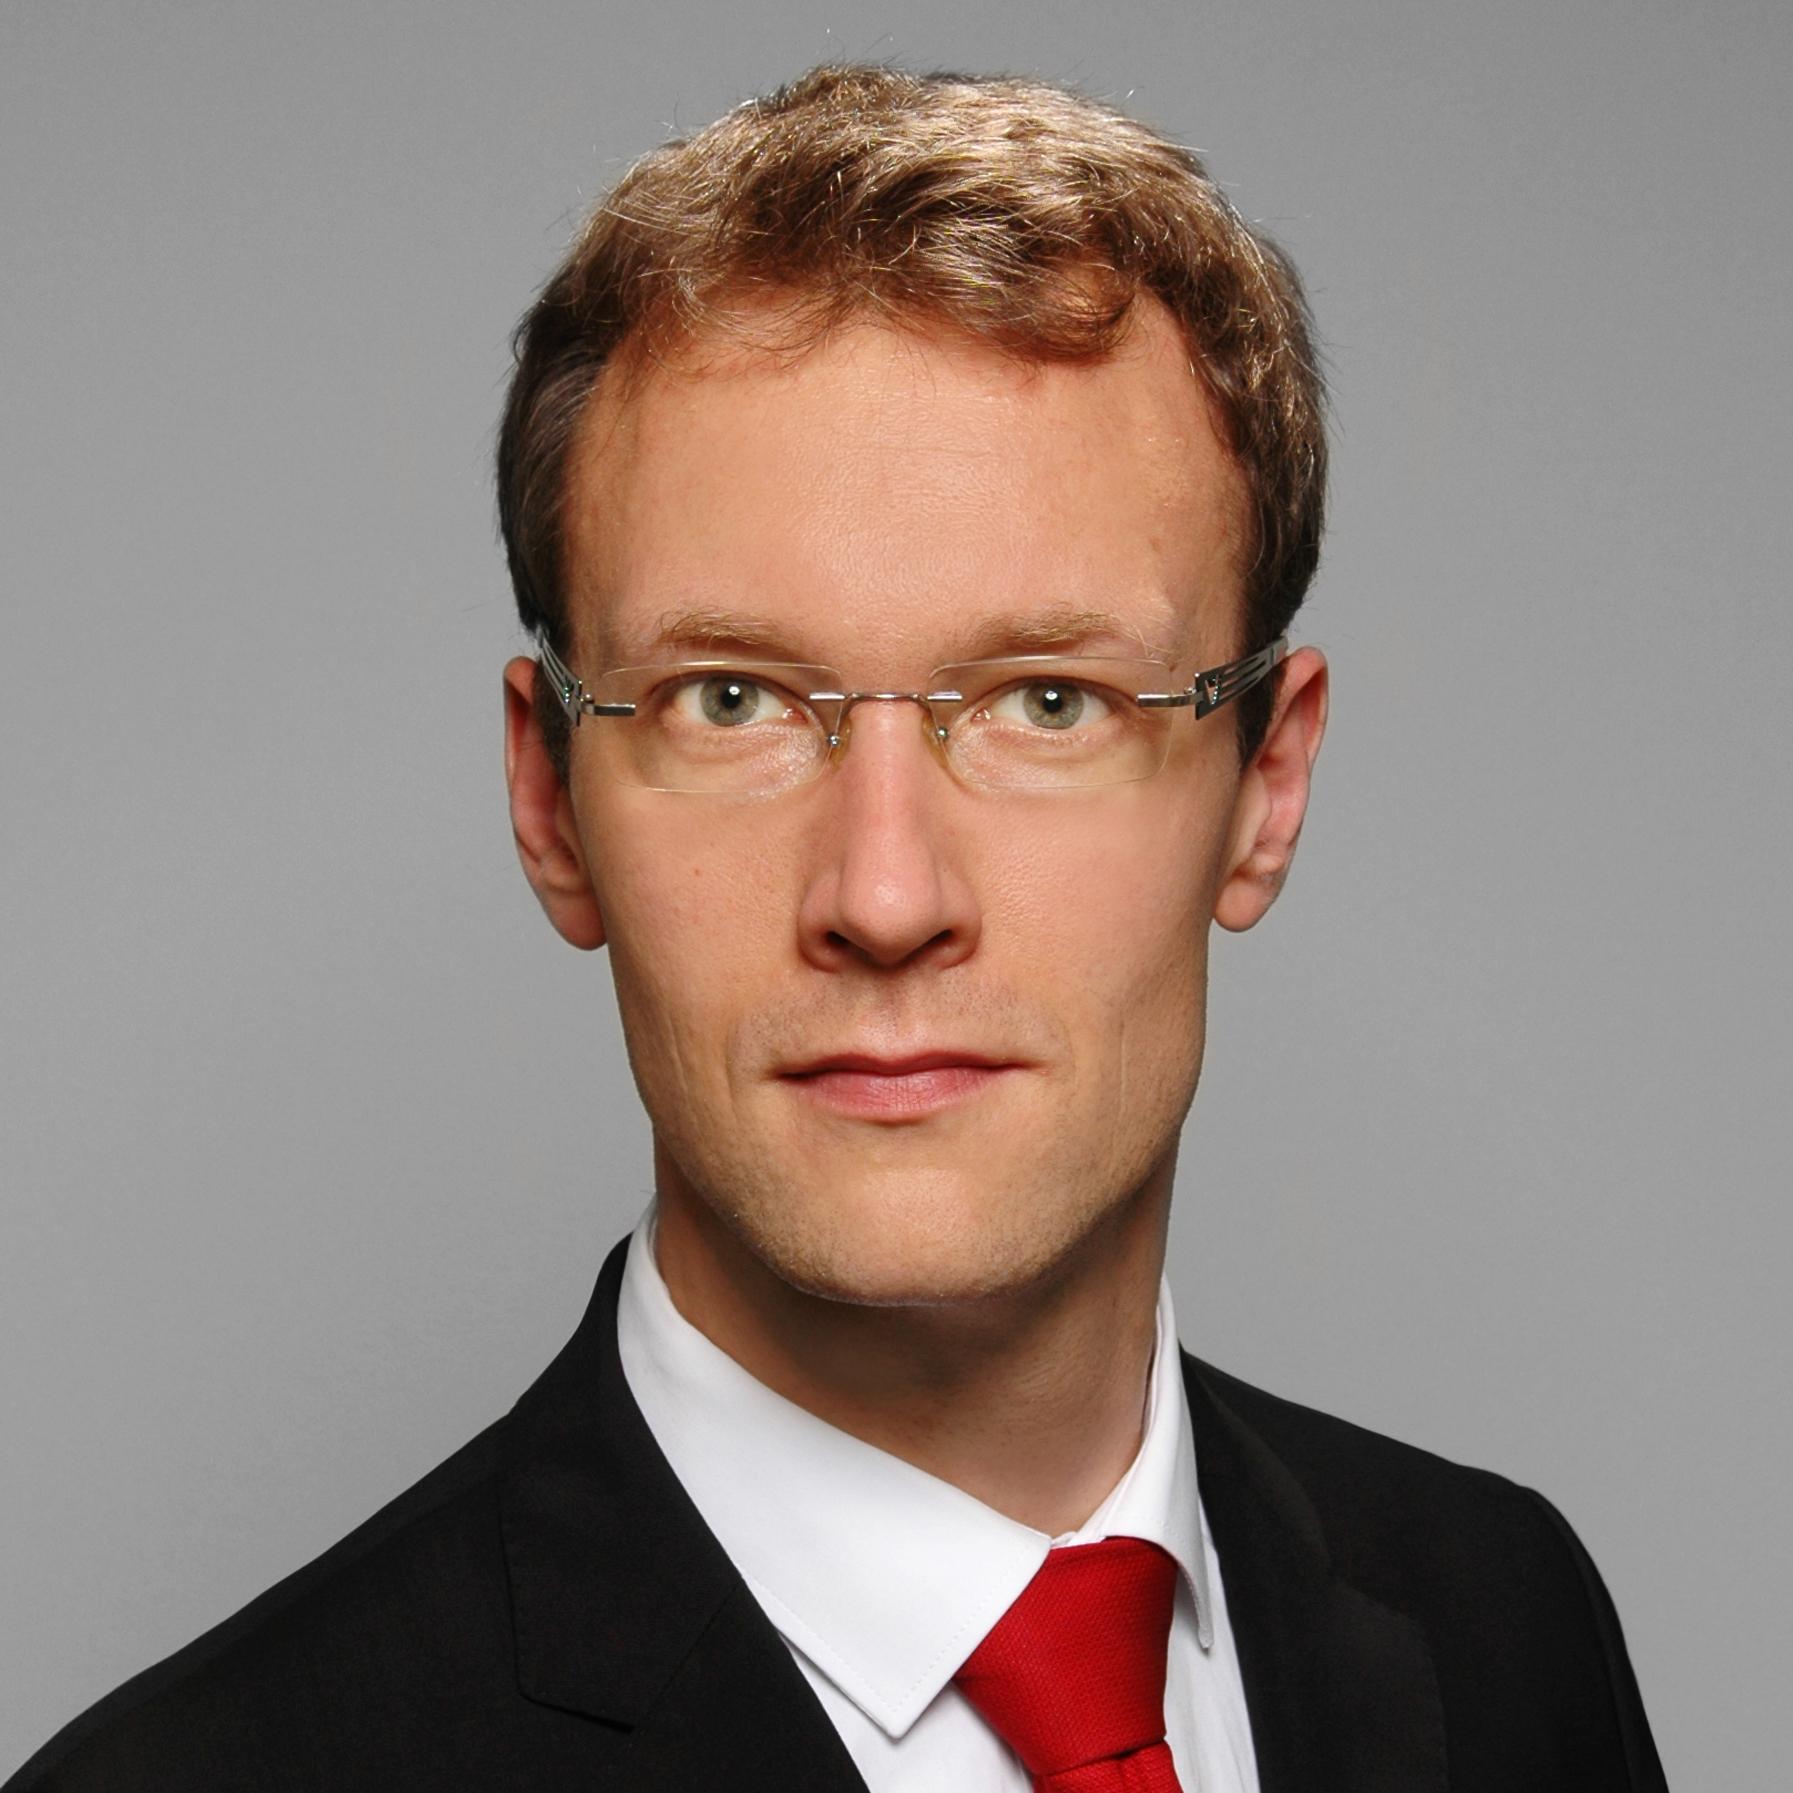 StB Prof. Dr. jur. Falko Tappen